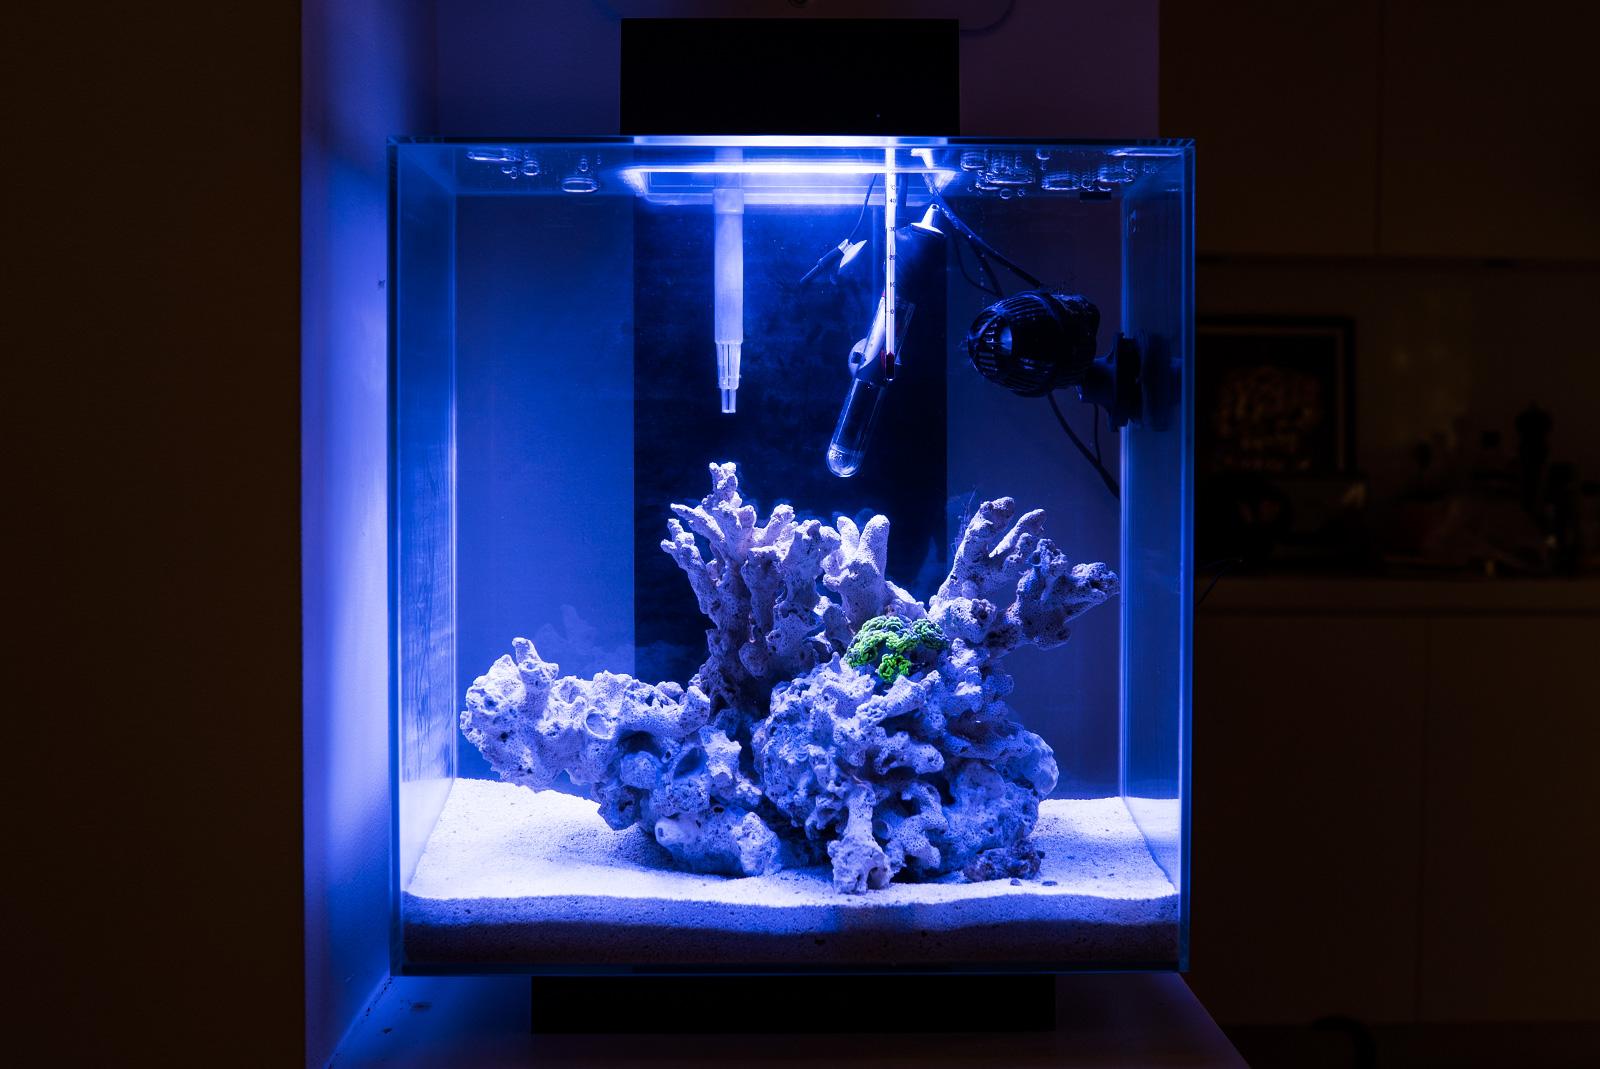 nano reef fluval edge 2 ultrabrite led justin fox. Black Bedroom Furniture Sets. Home Design Ideas